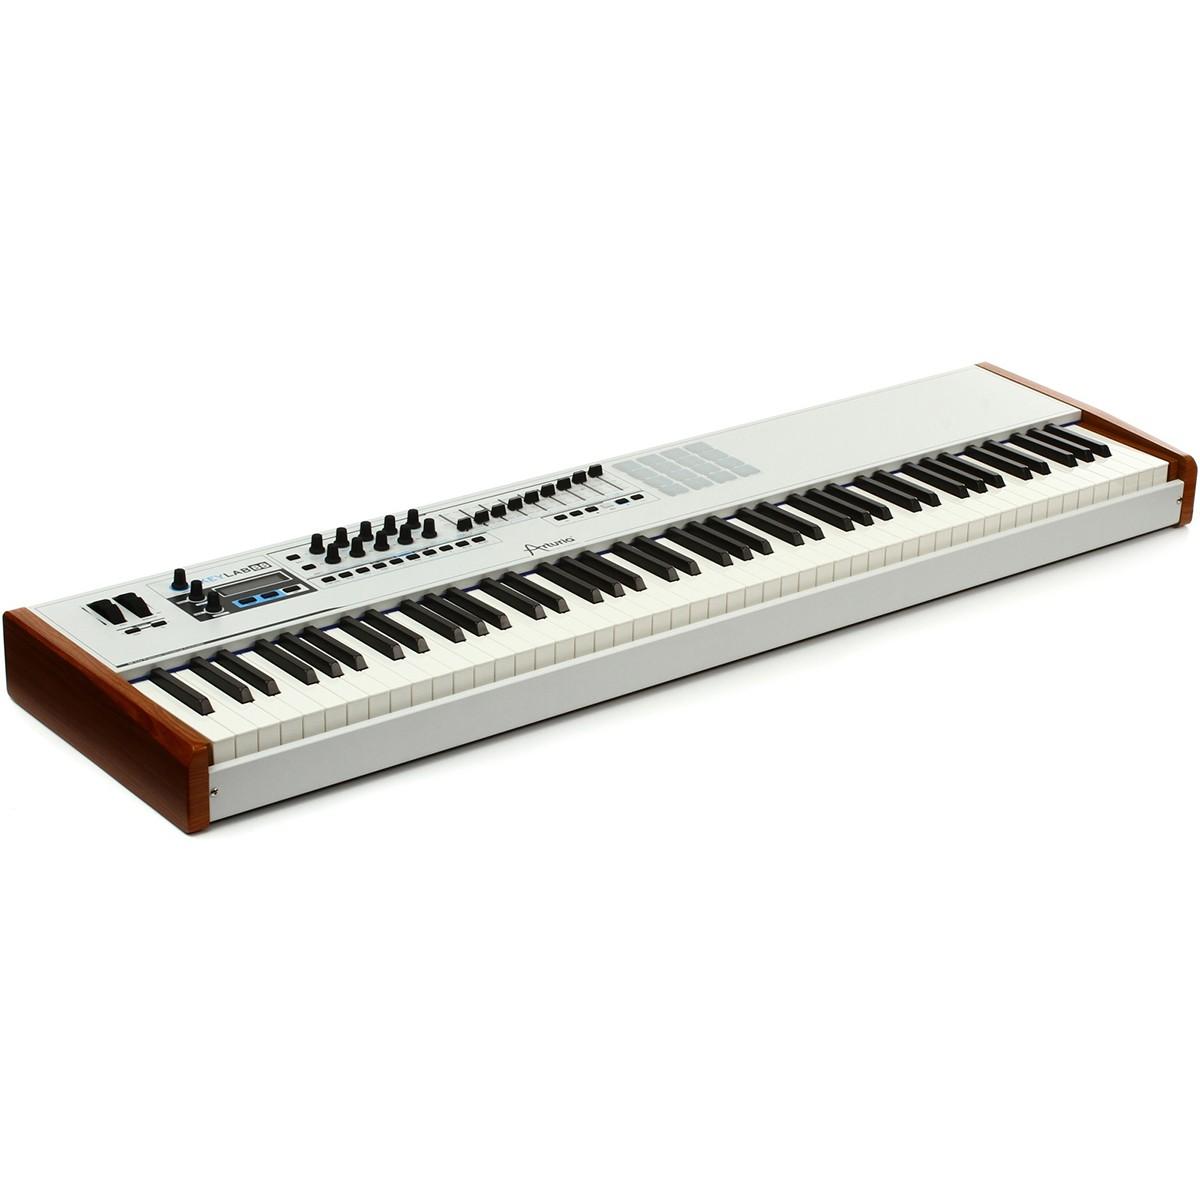 Arturia KeyLab 88, Controladora 88 Keyboard, Bivolt